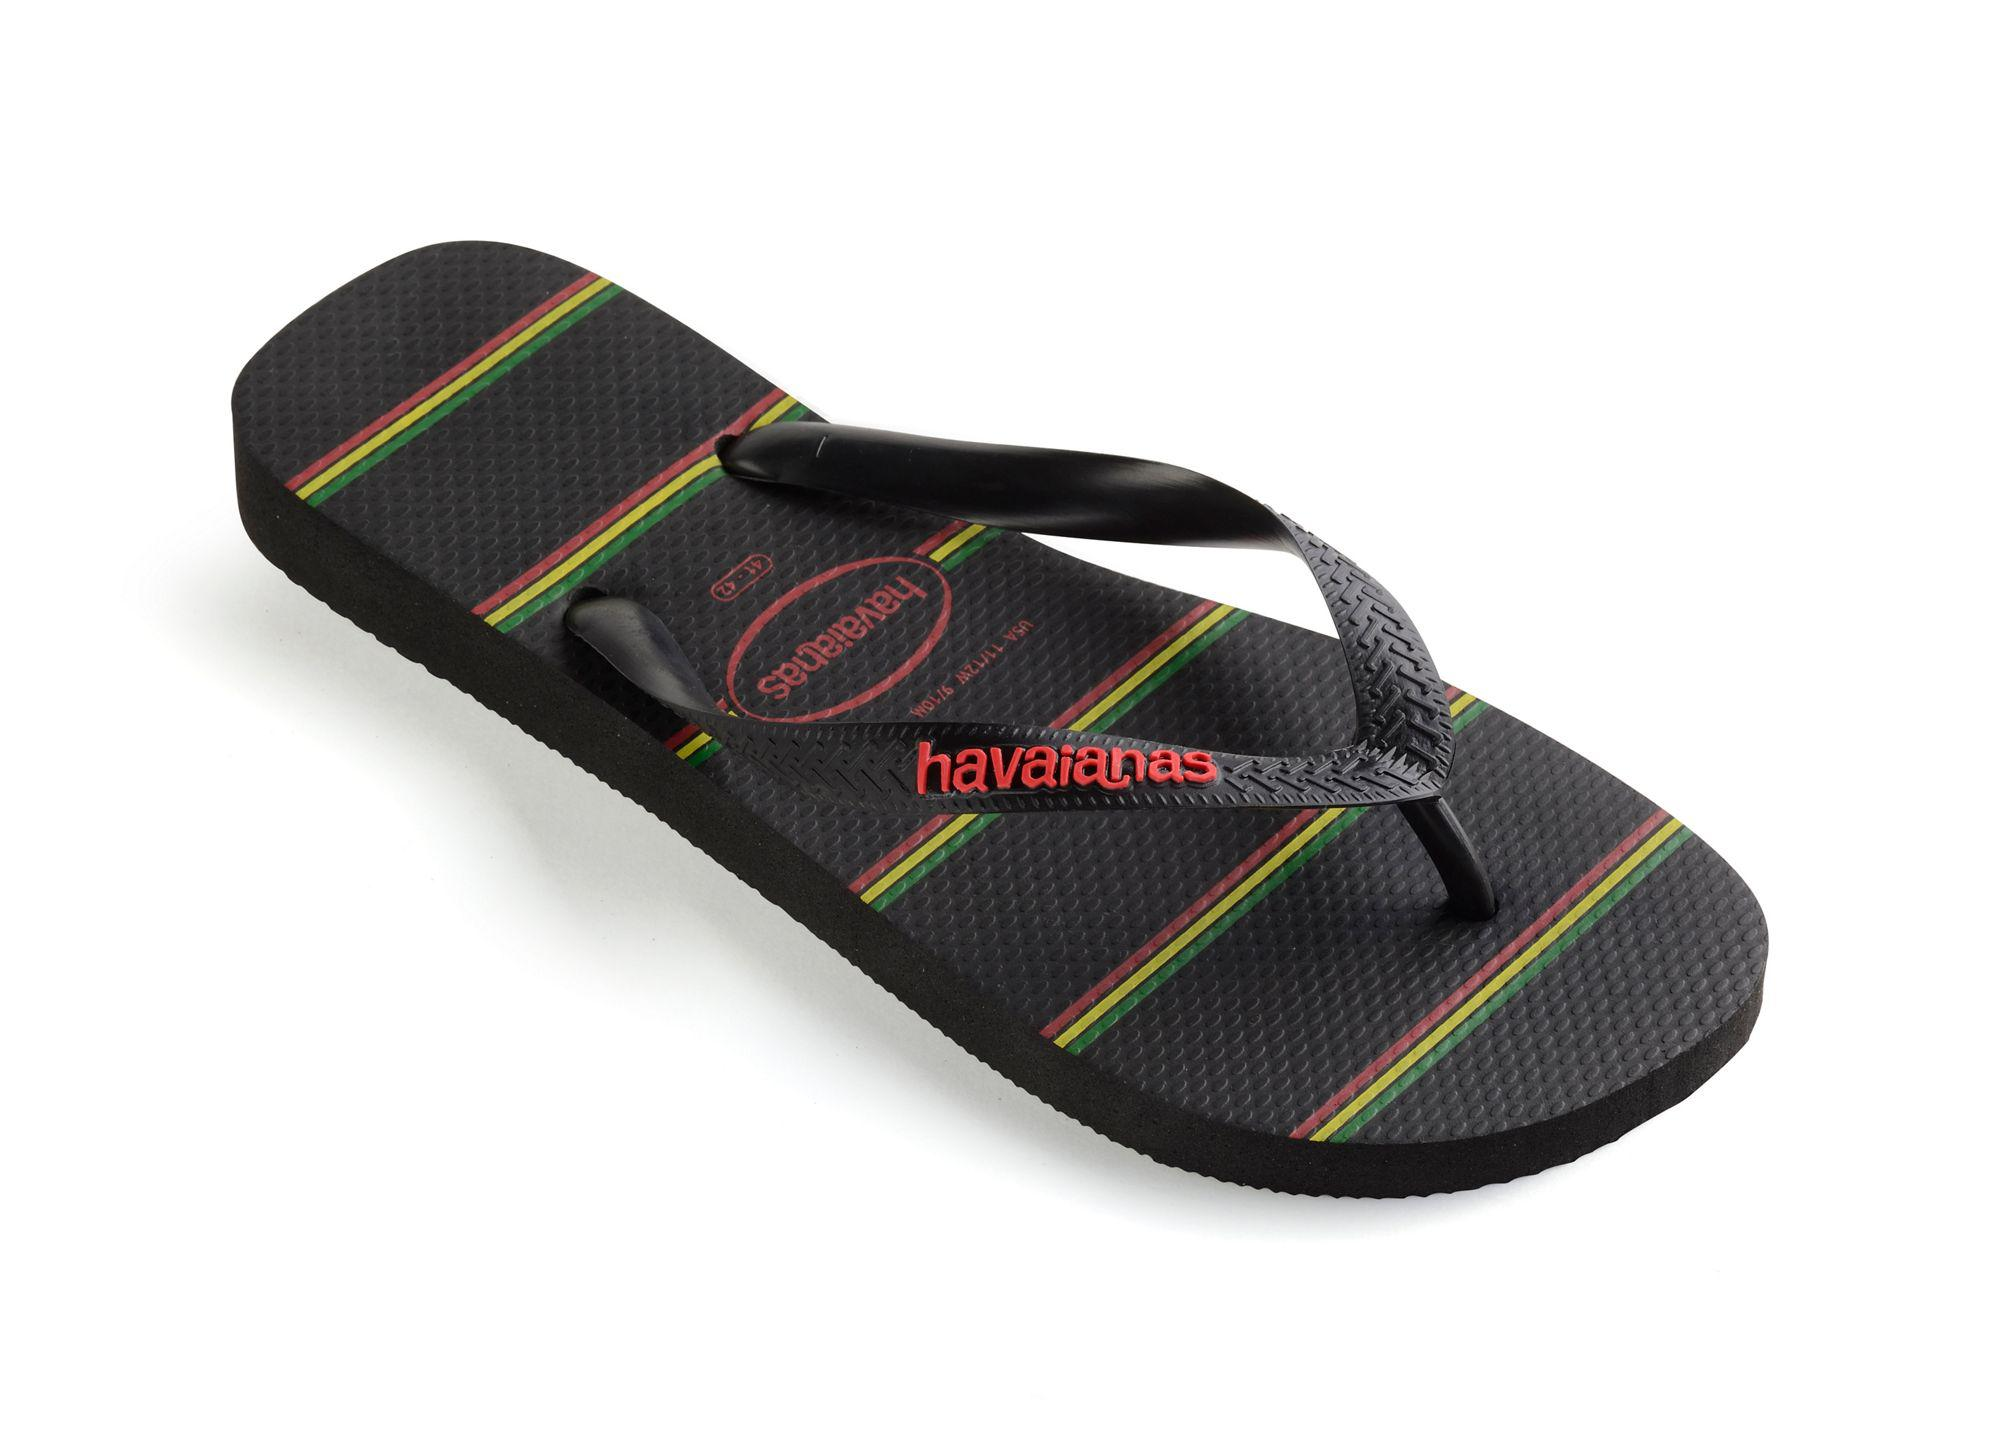 fc889bcd5 Havaianas - Black Top Stripes Logo Flip Flops for Men - Lyst. View  fullscreen